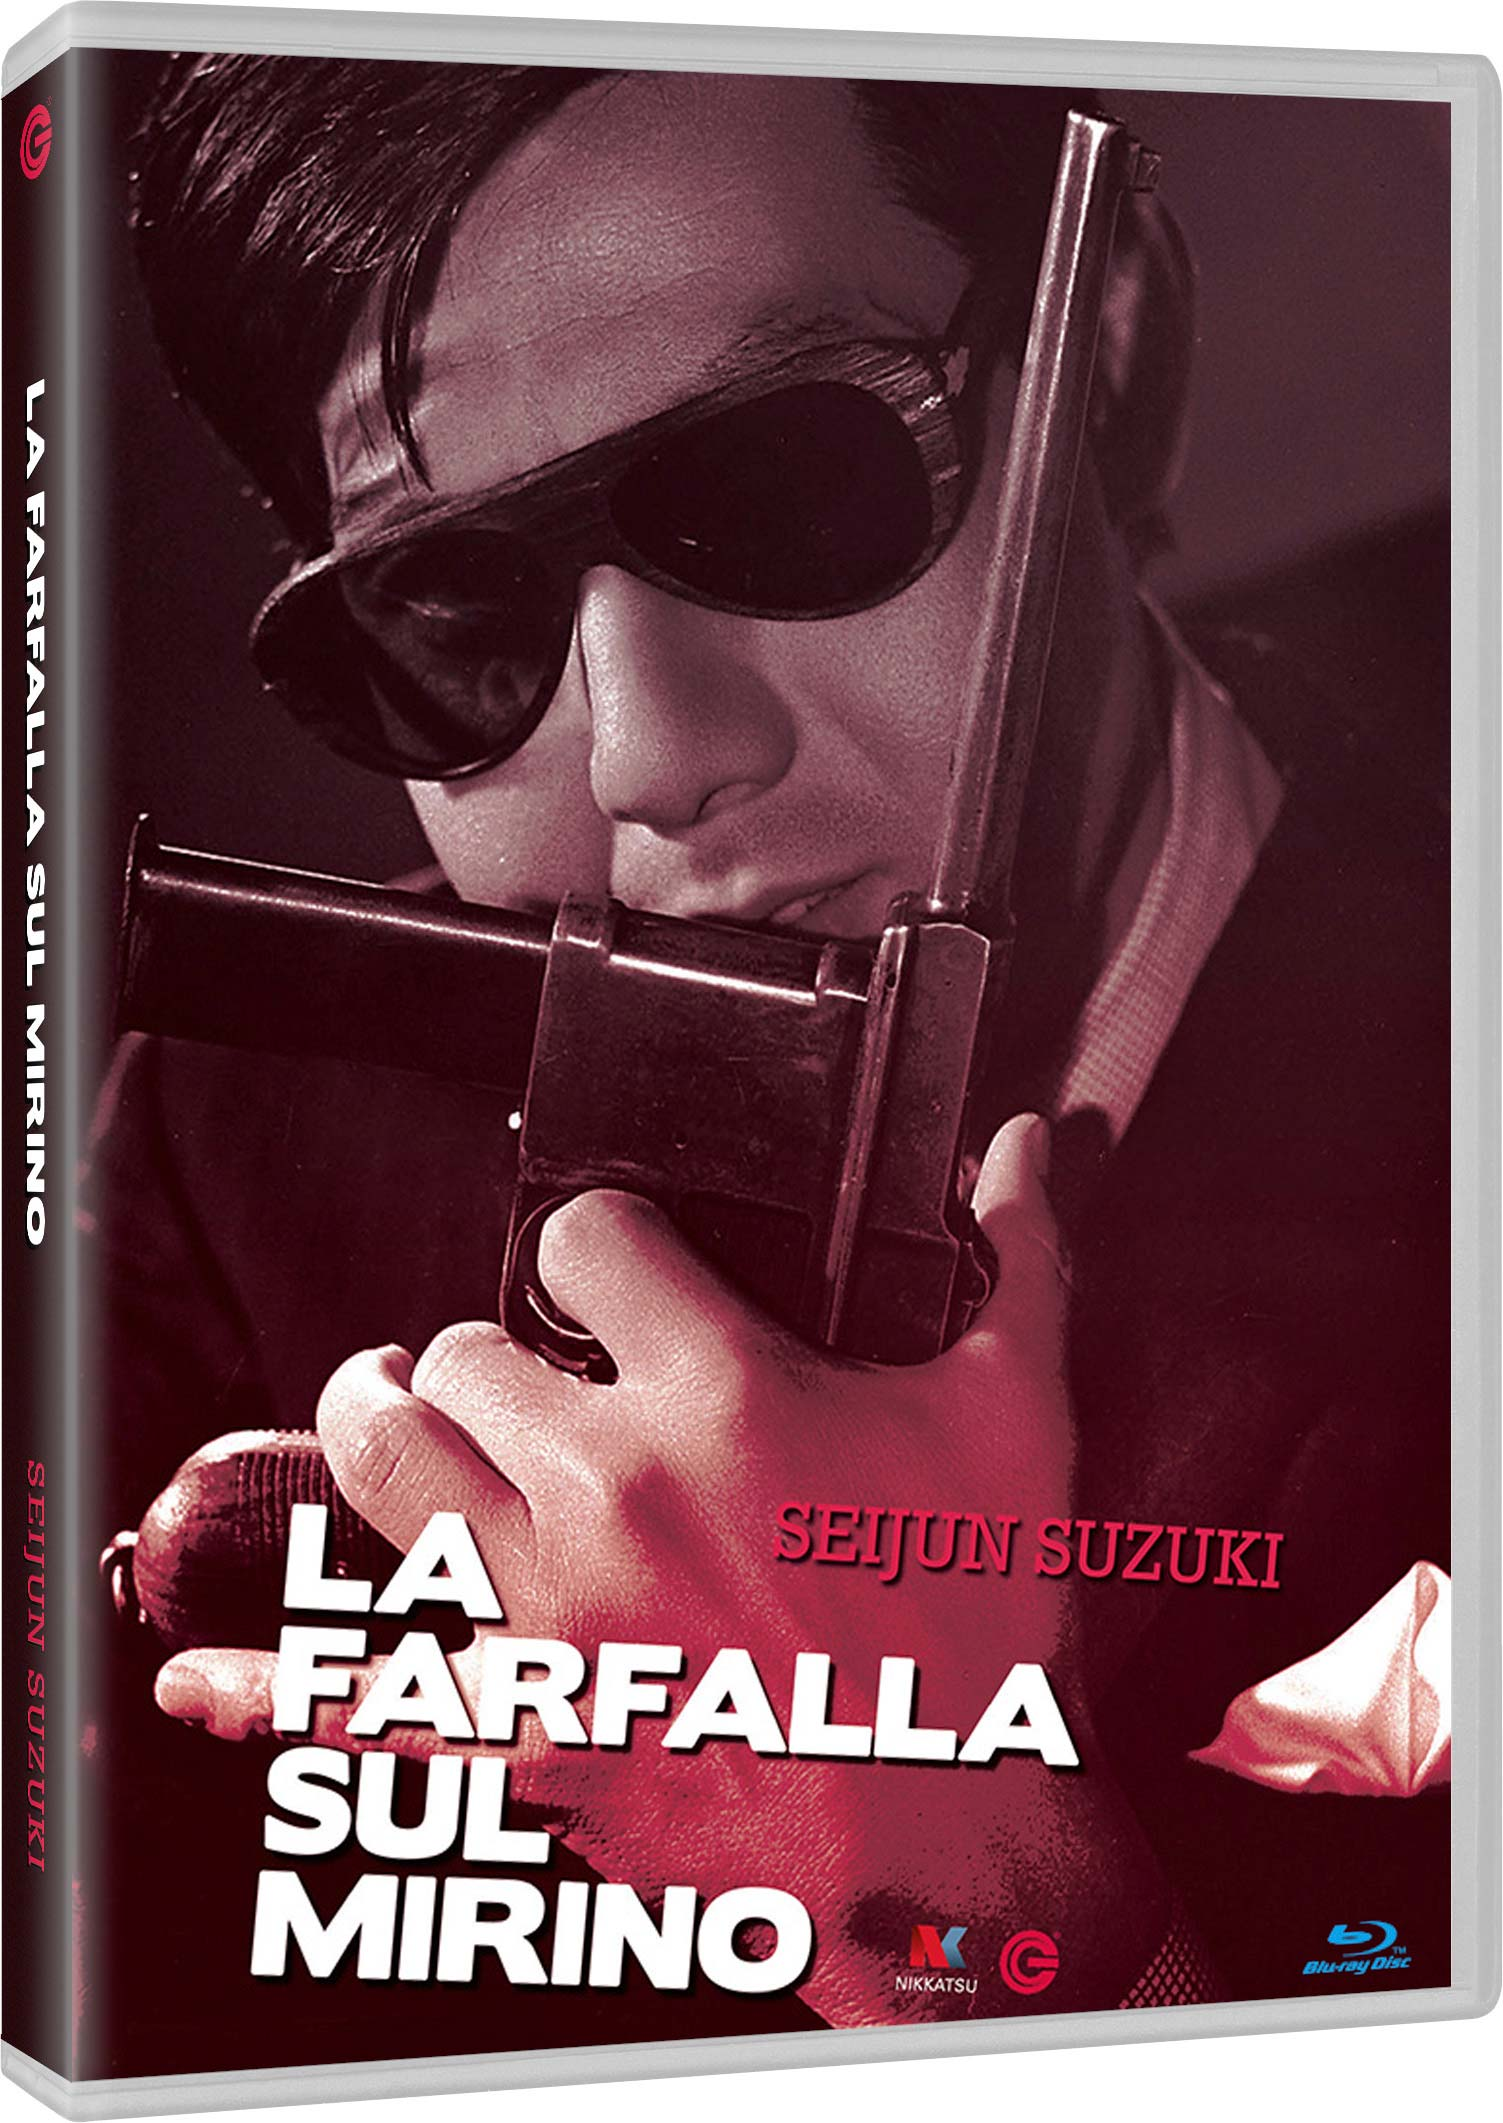 LA FARFALLA SUL MIRINO - BLU RAY